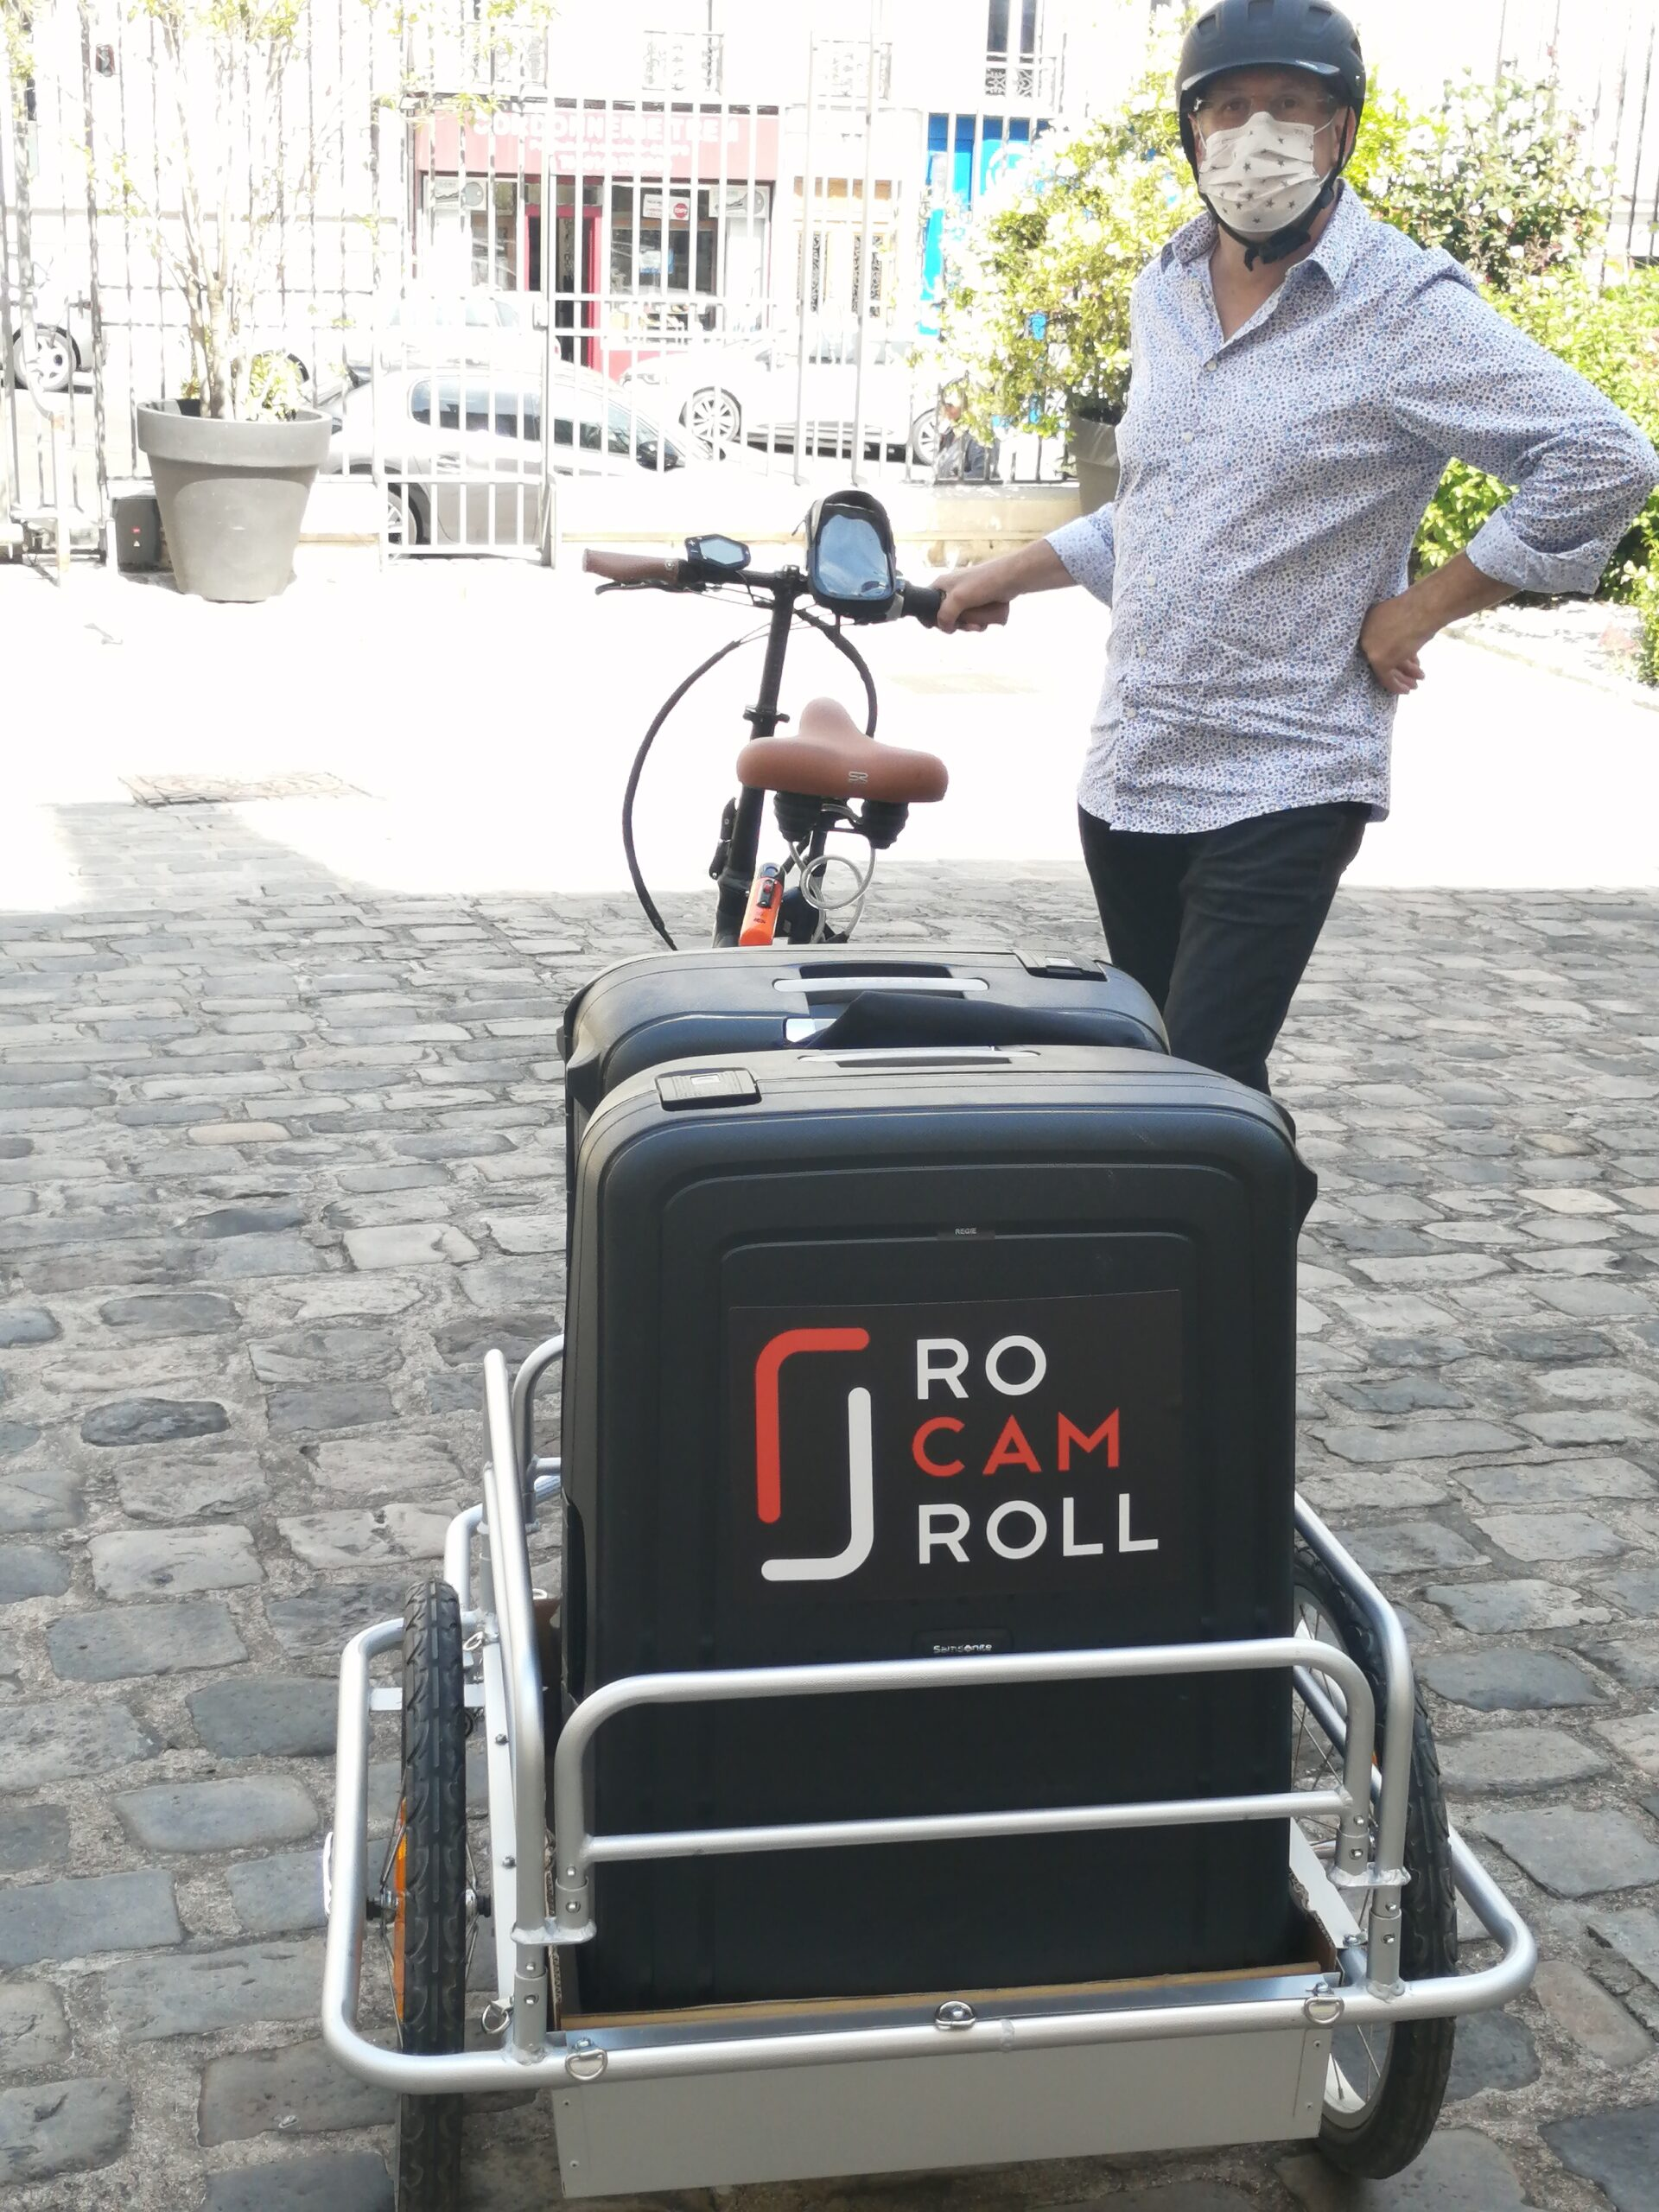 Transport audiovisuel à velo